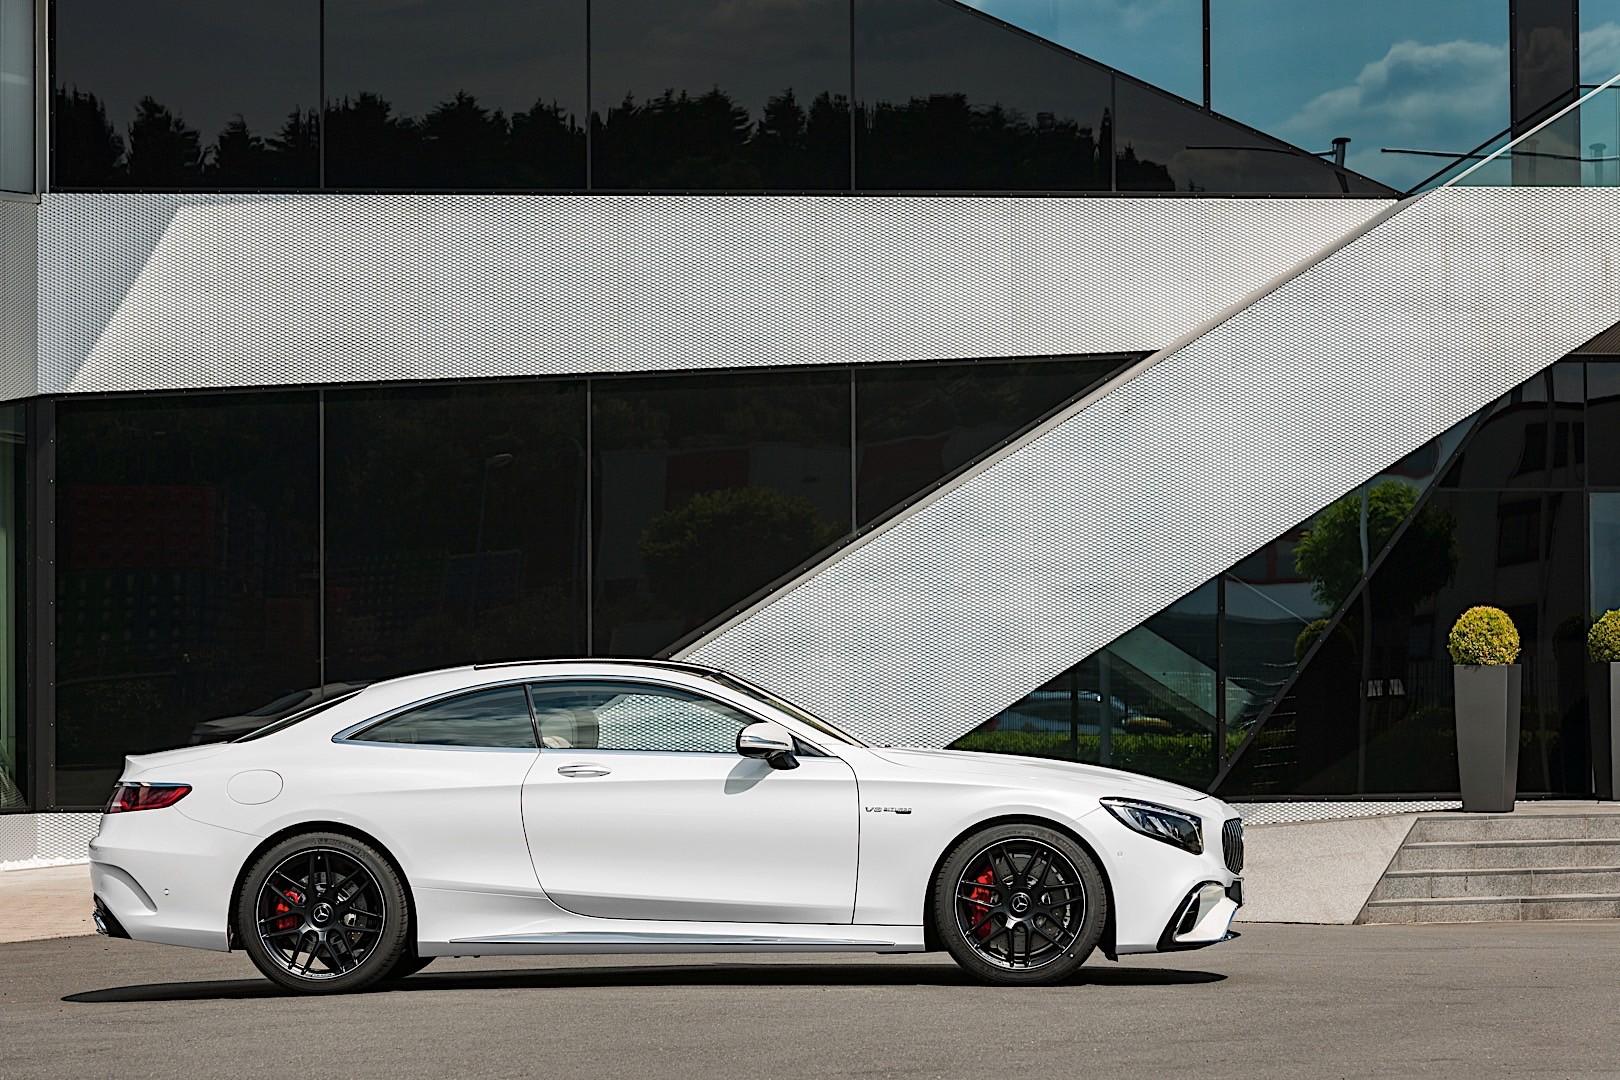 Mercedes Amg S 63 Coupe C217 2017 Present